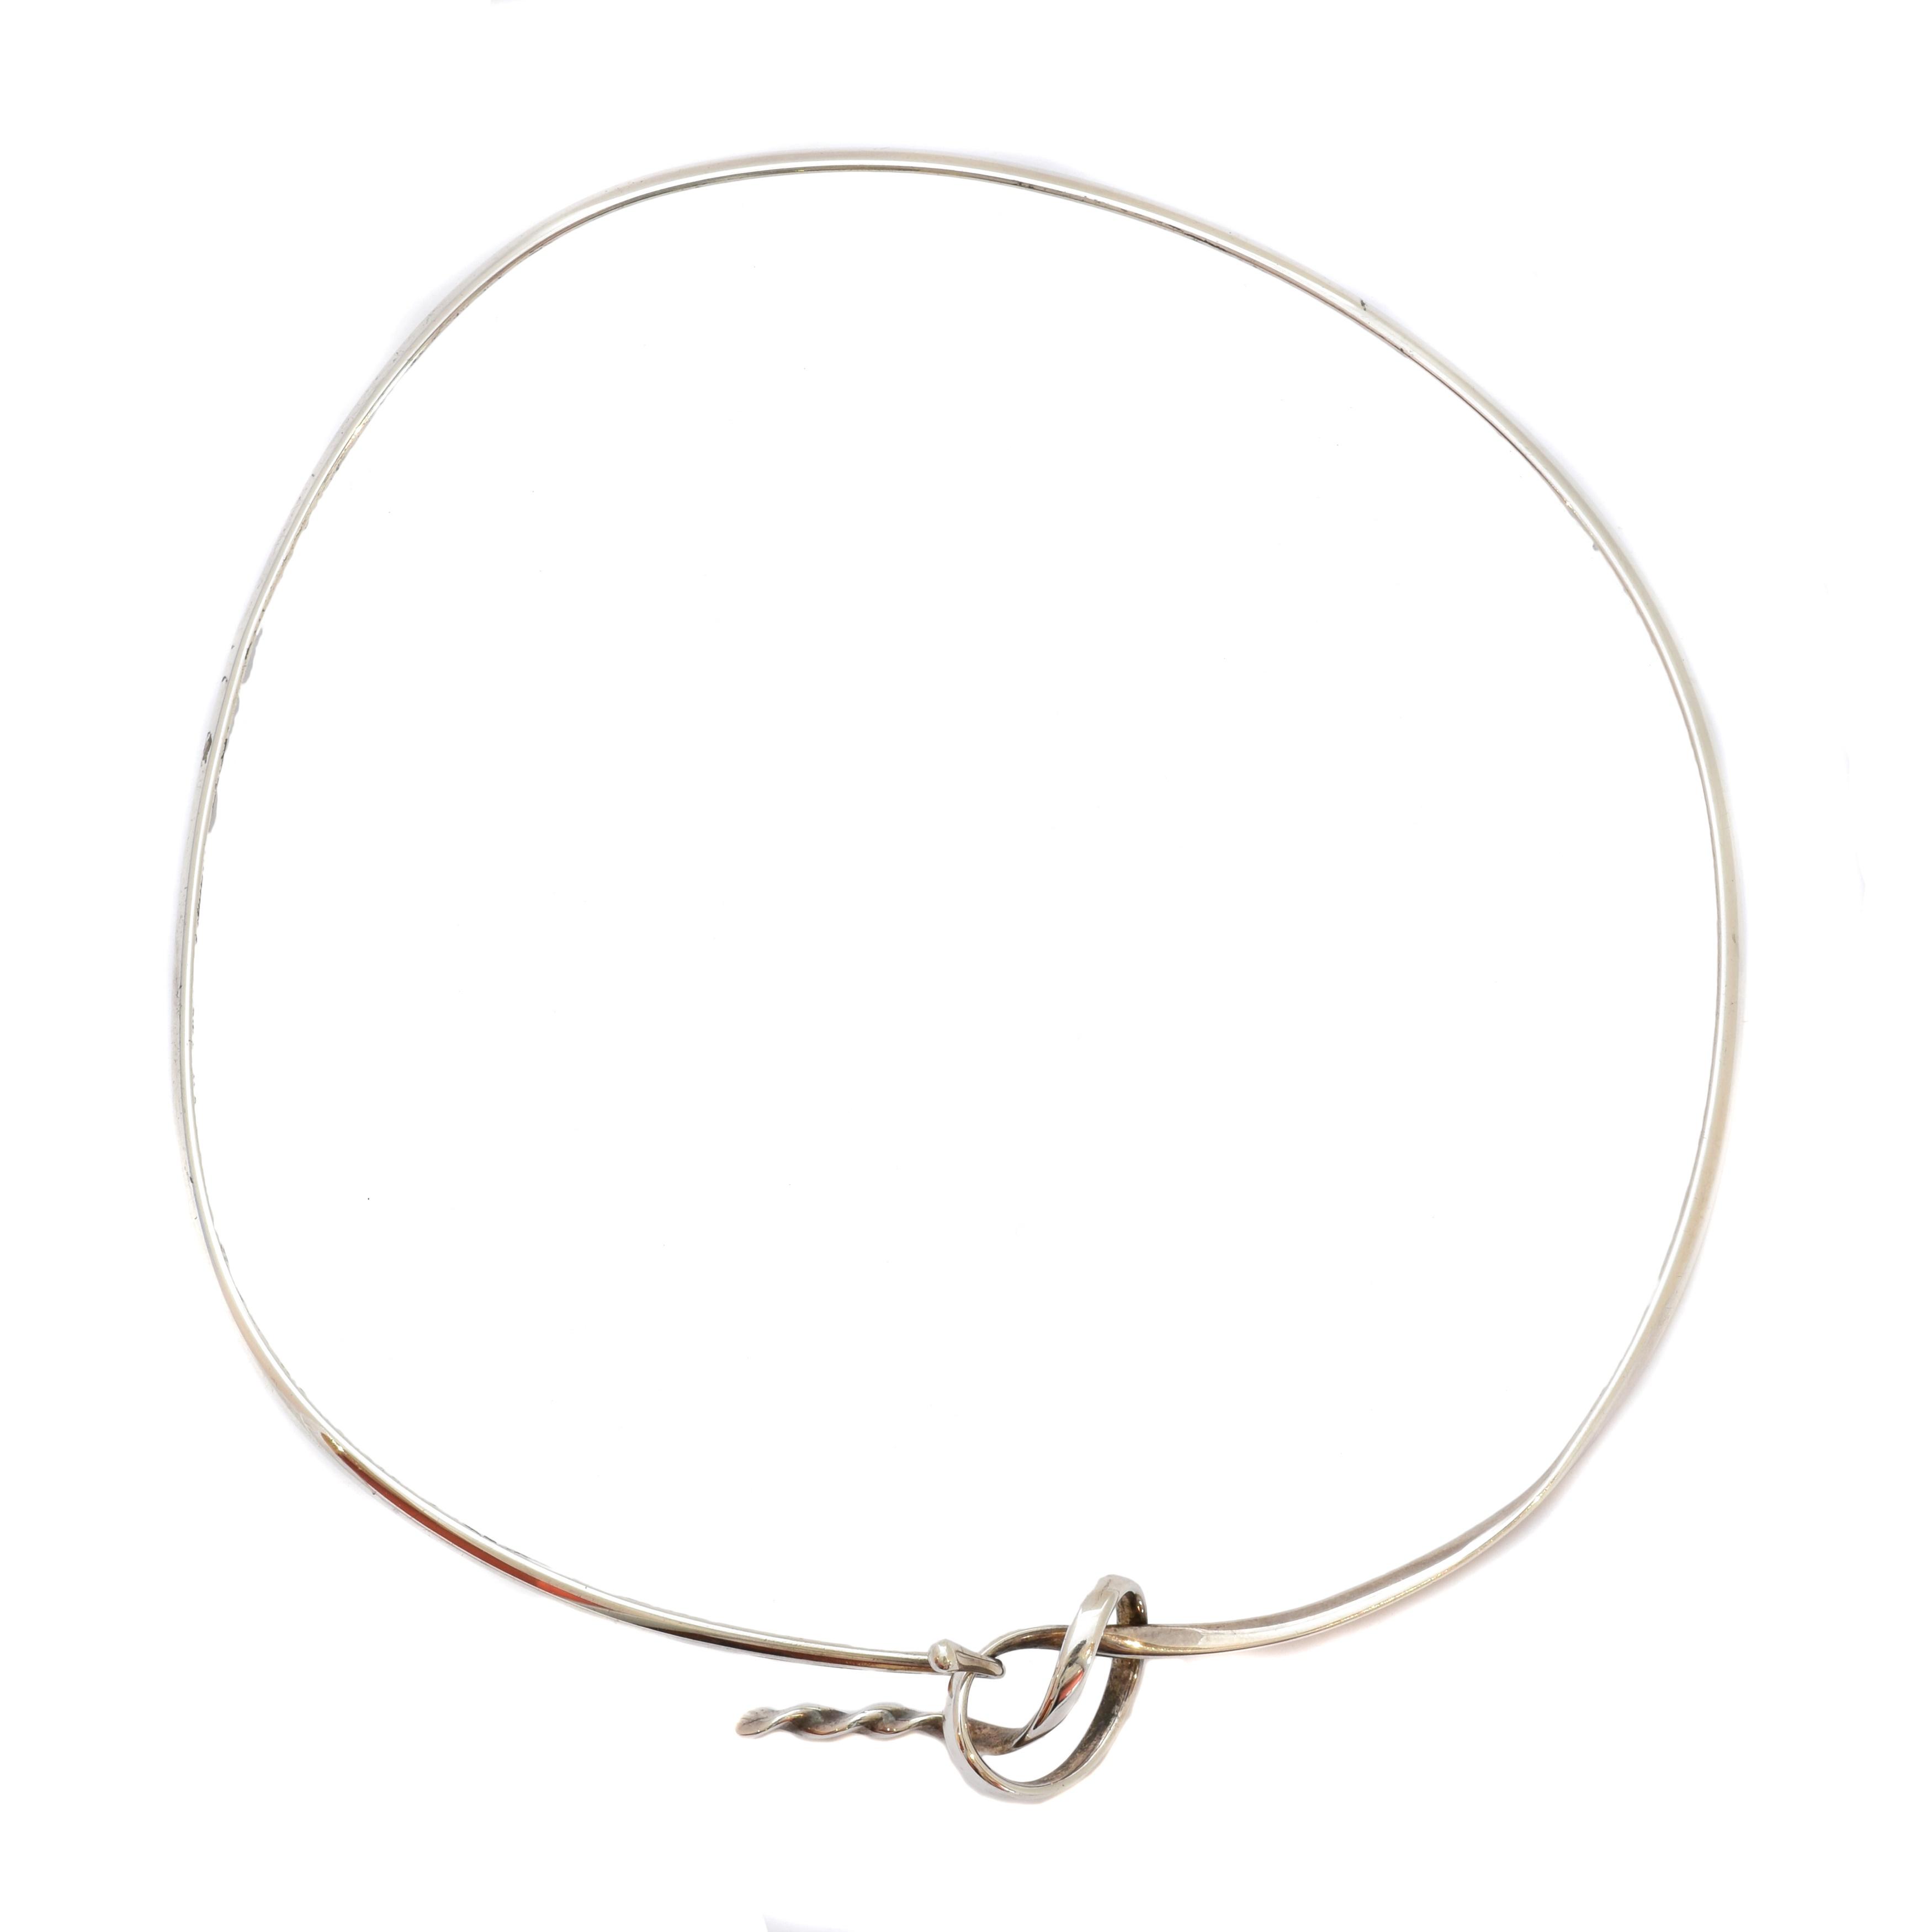 A Georg Jensen 'Forget me Knot' collar, no. 241, designed by Vivianna Torun Bülow-Hübe for Georg Jensen,